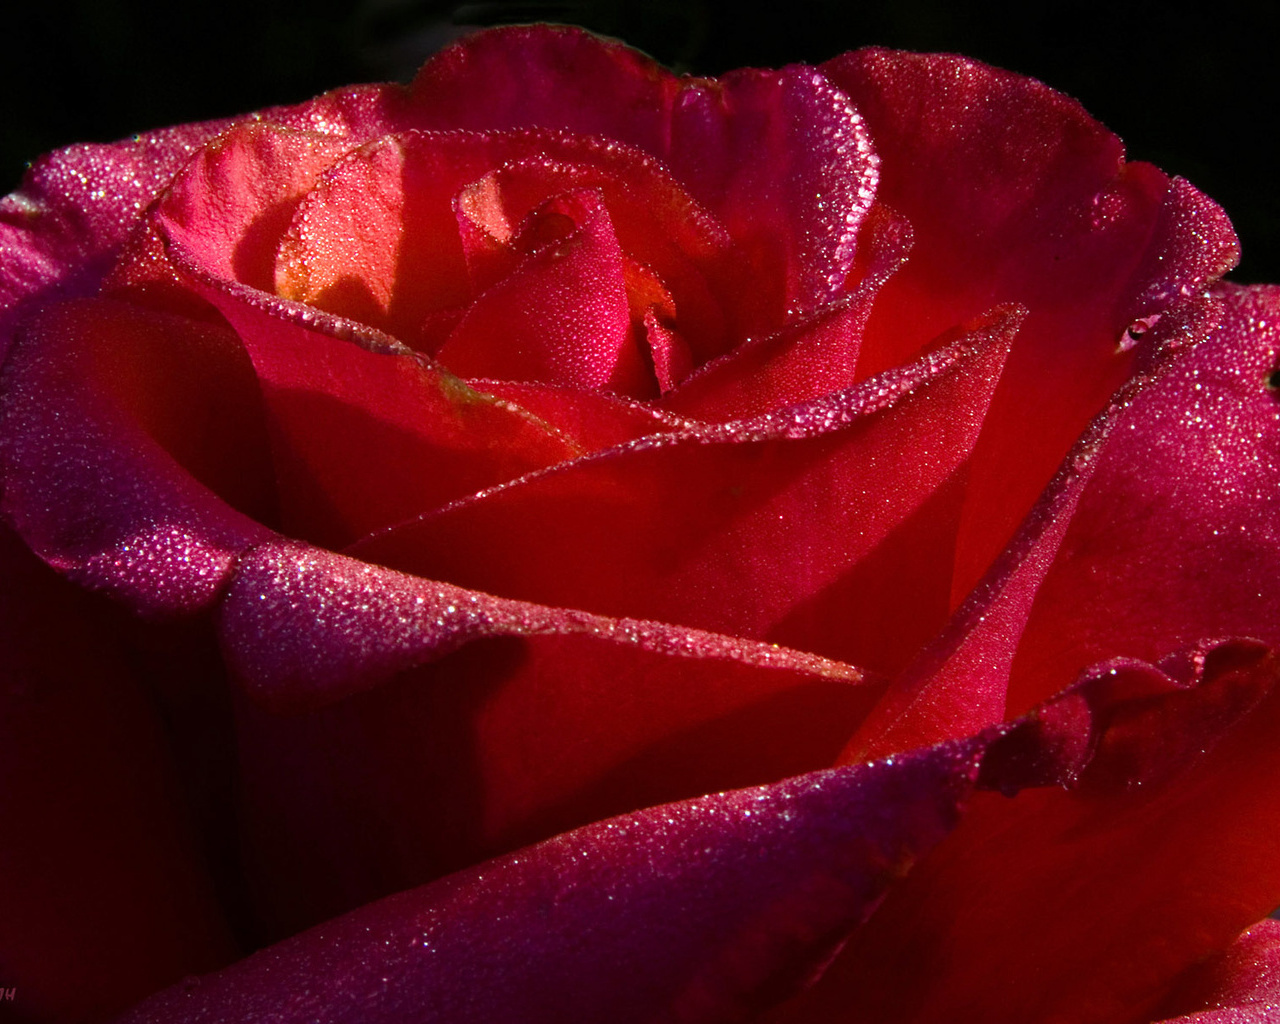 Red Roses Desktop Wallpapers   Wallpaper High Definition High 1280x1024